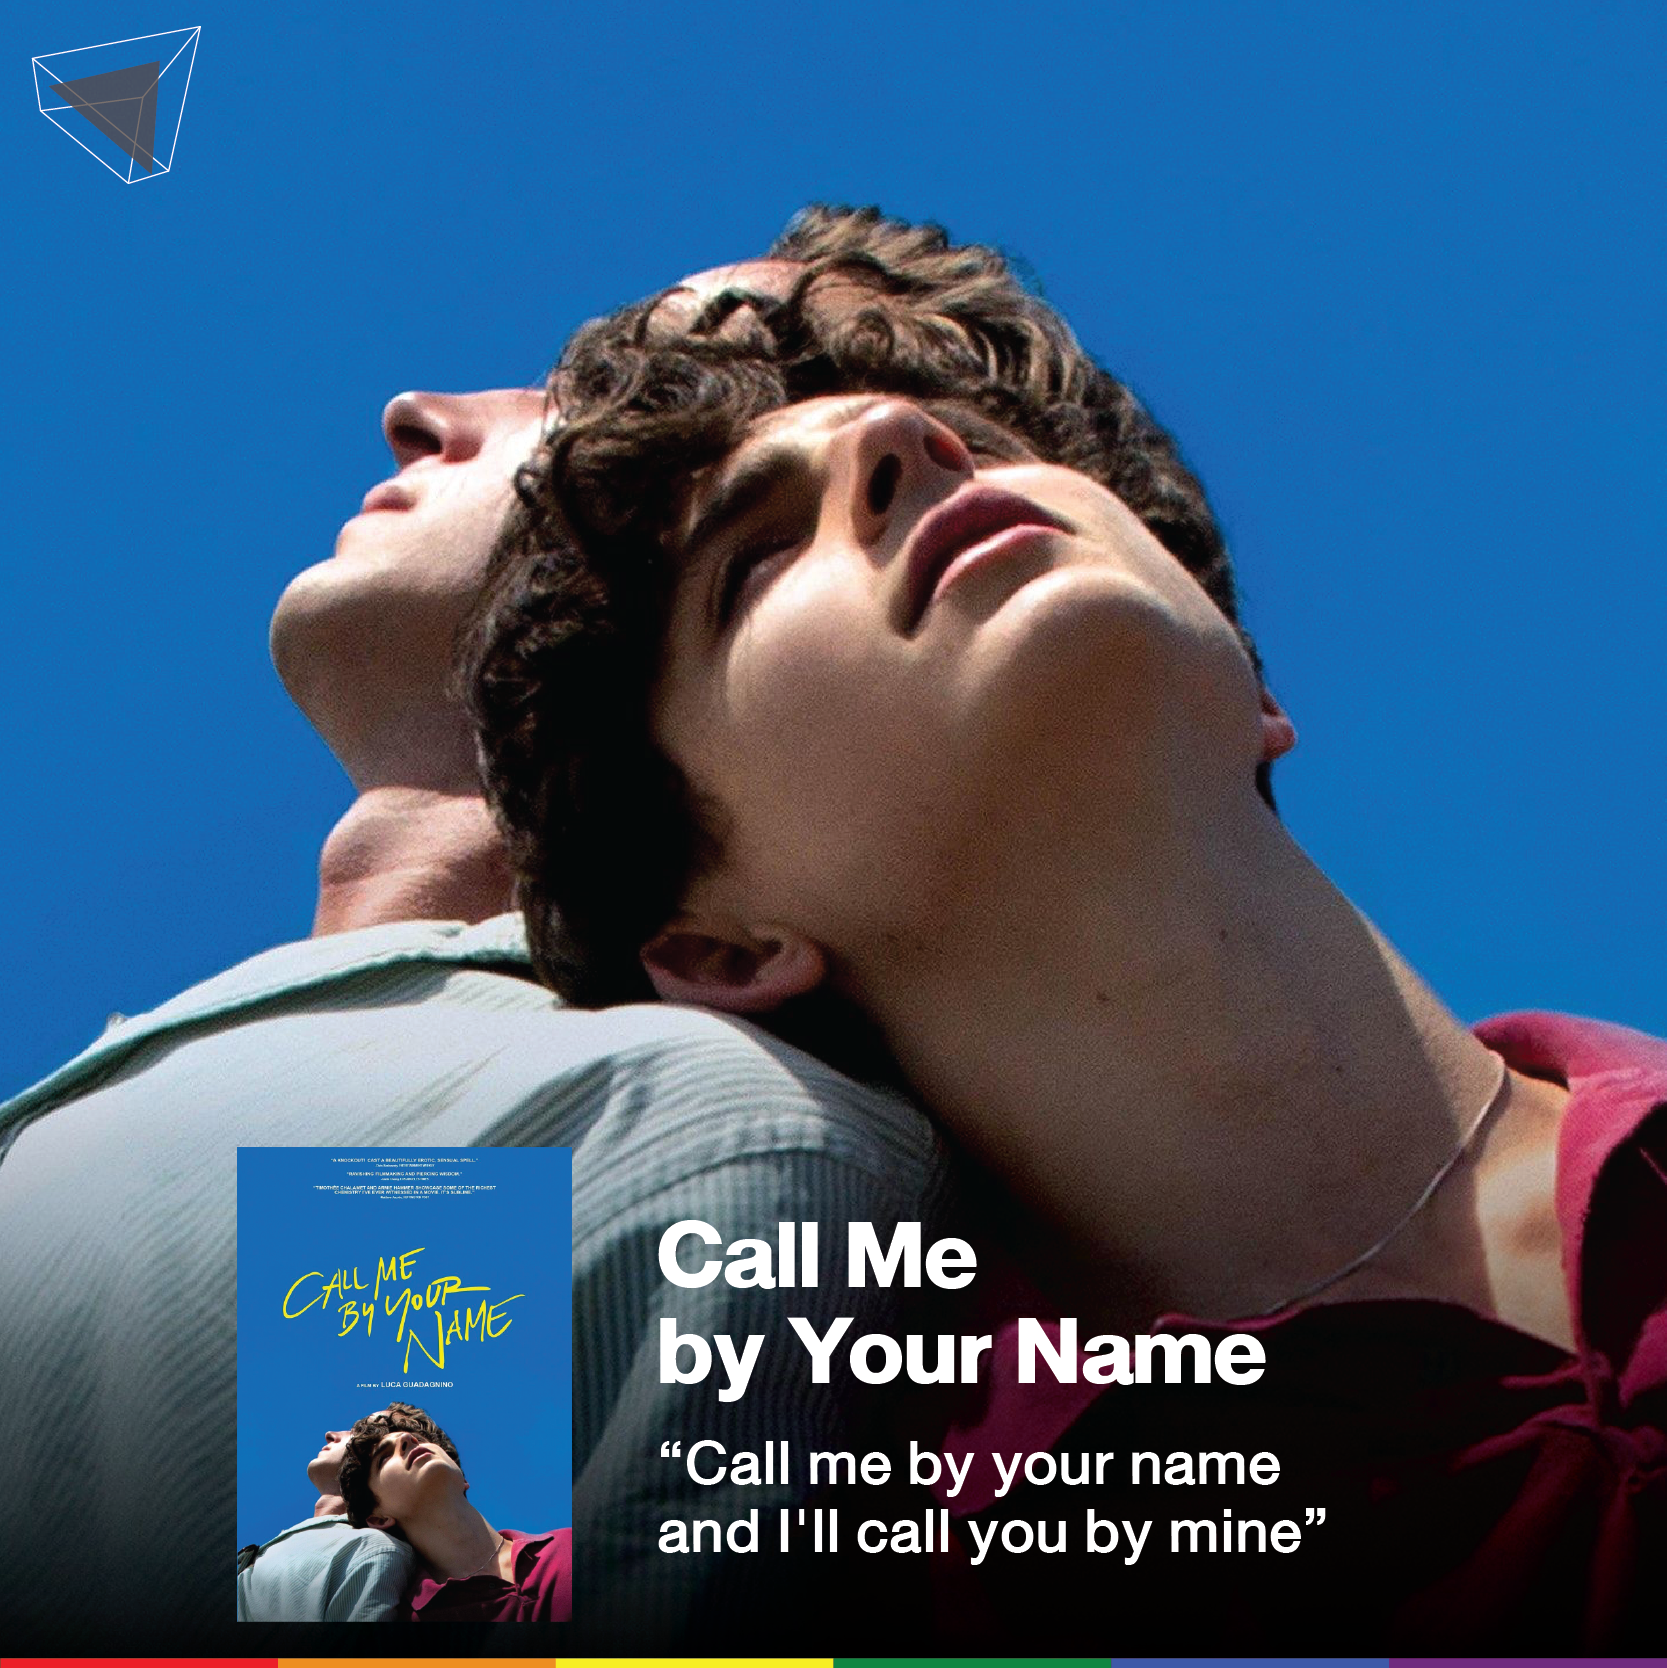 Call Me by Your Name (2017) หนังเกย์ที่ใครไม่ดู ถือว่าพลาด!